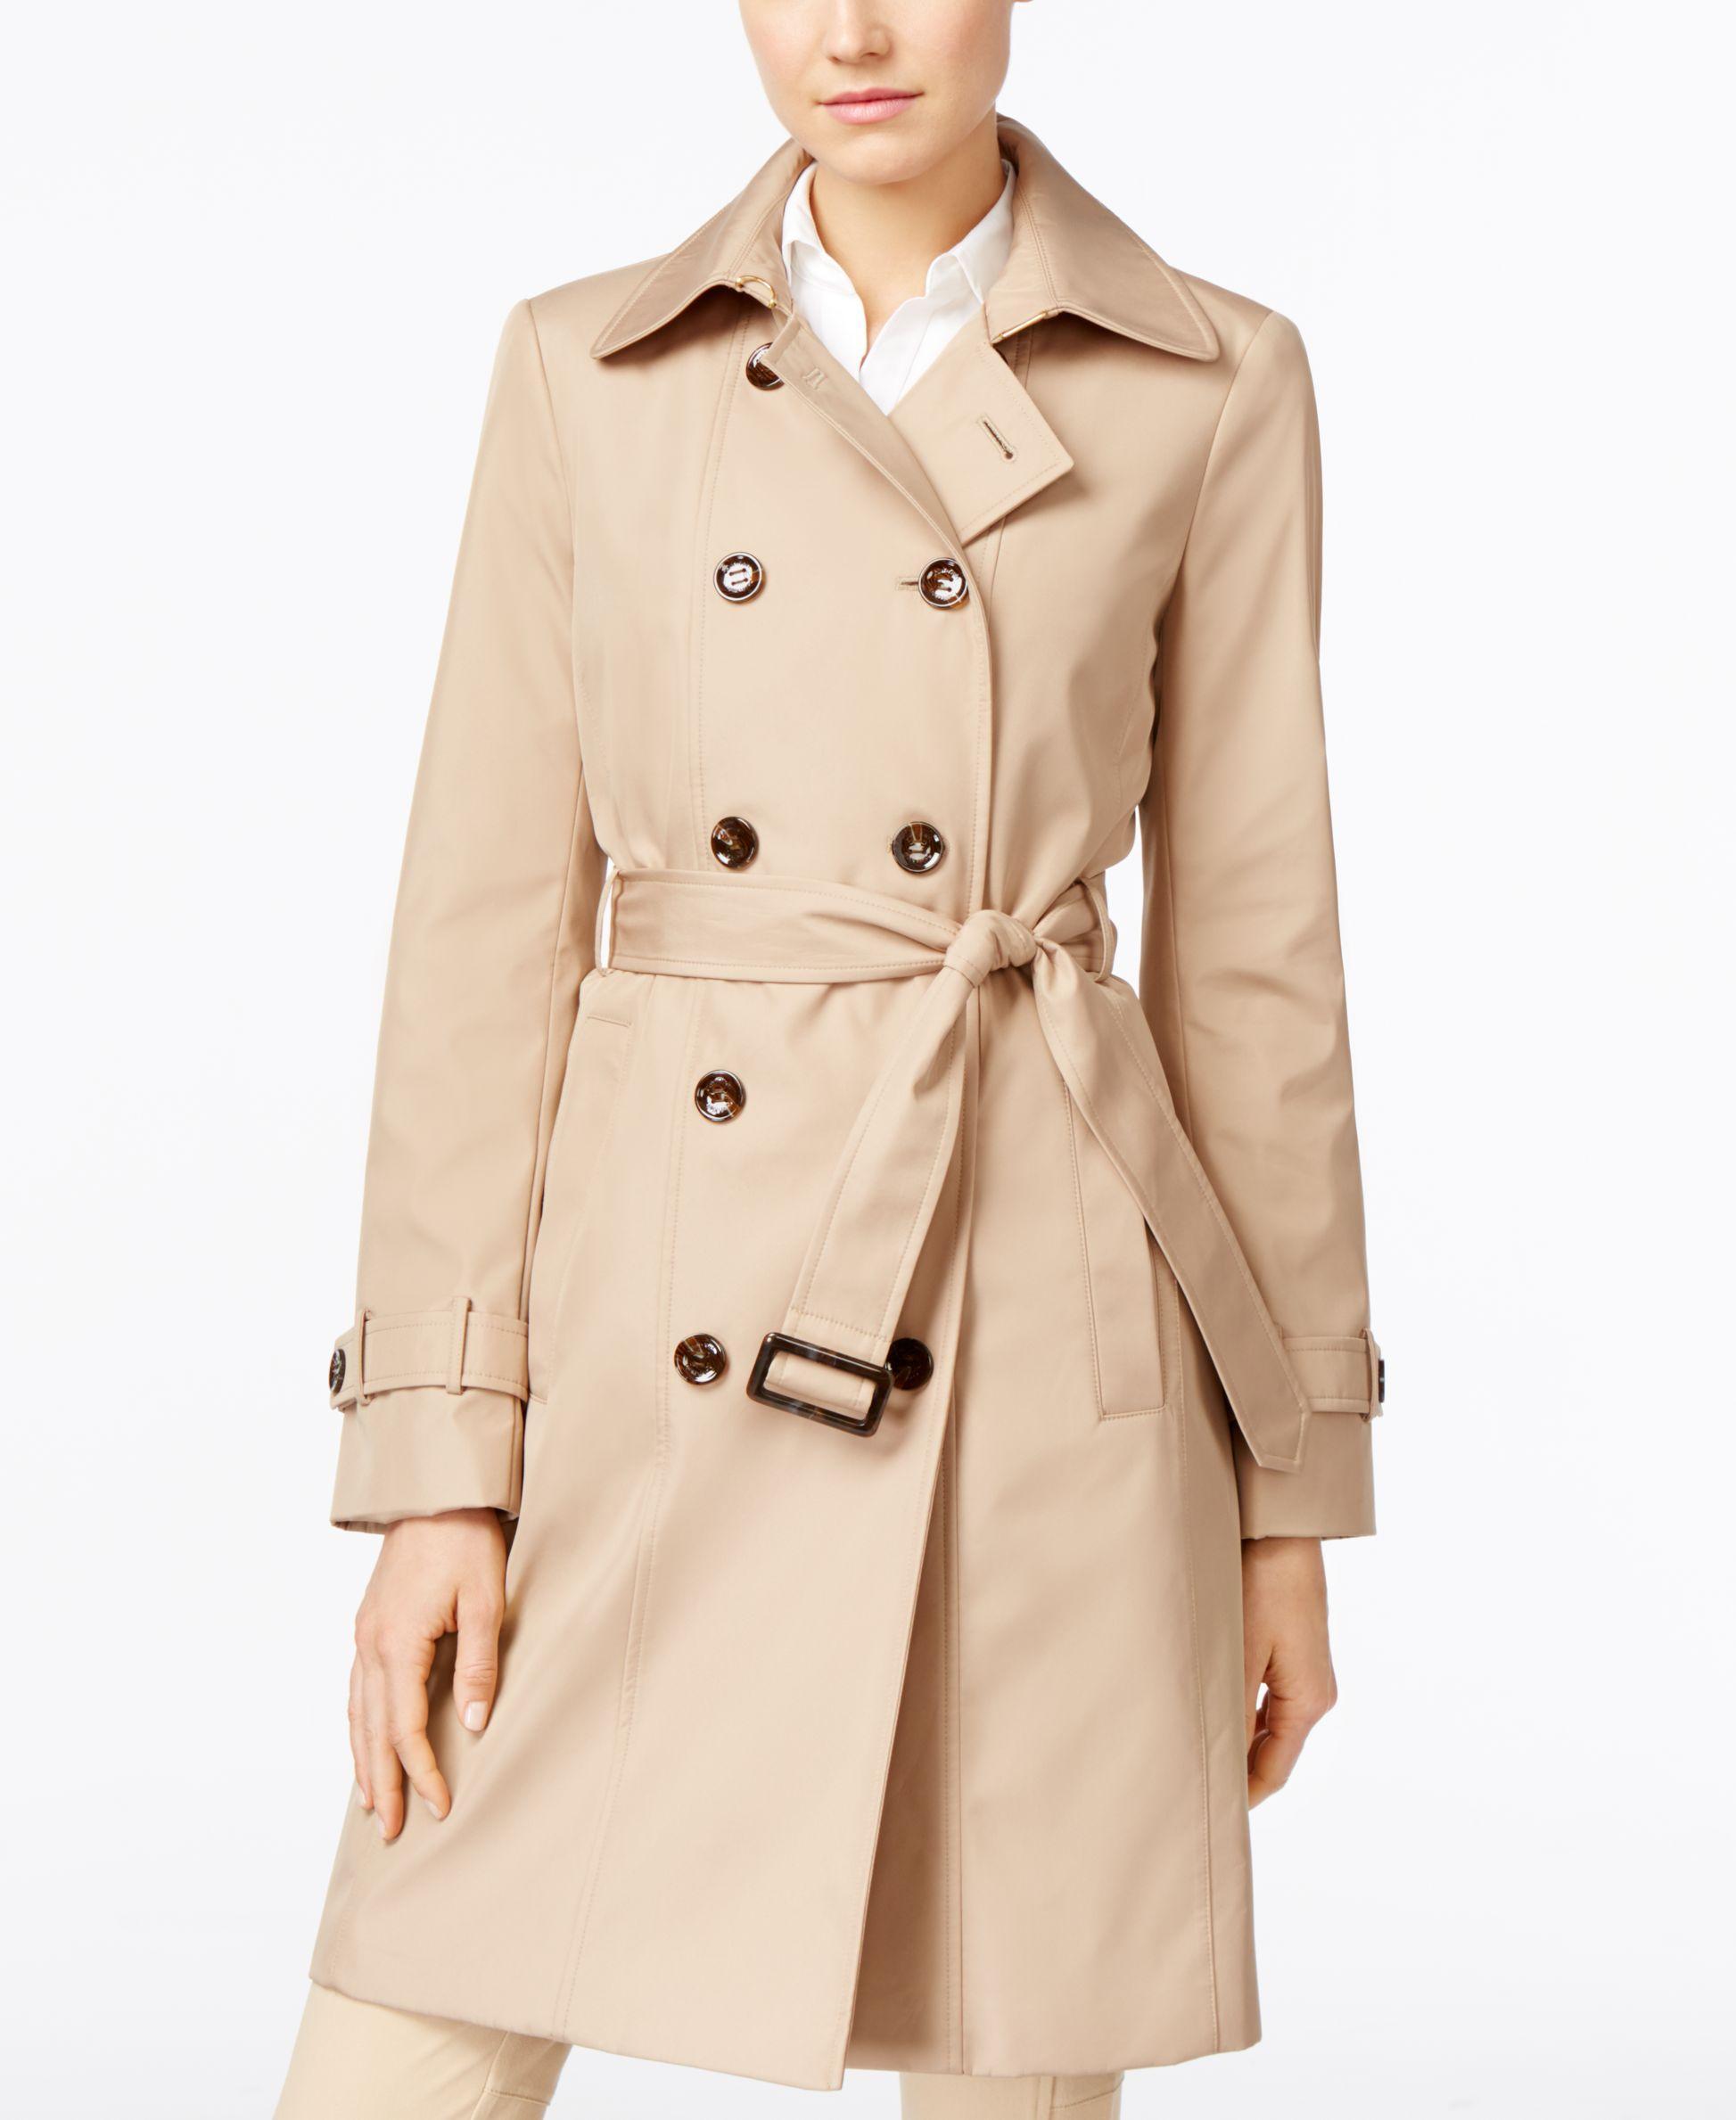 Calvin klein trench coat women